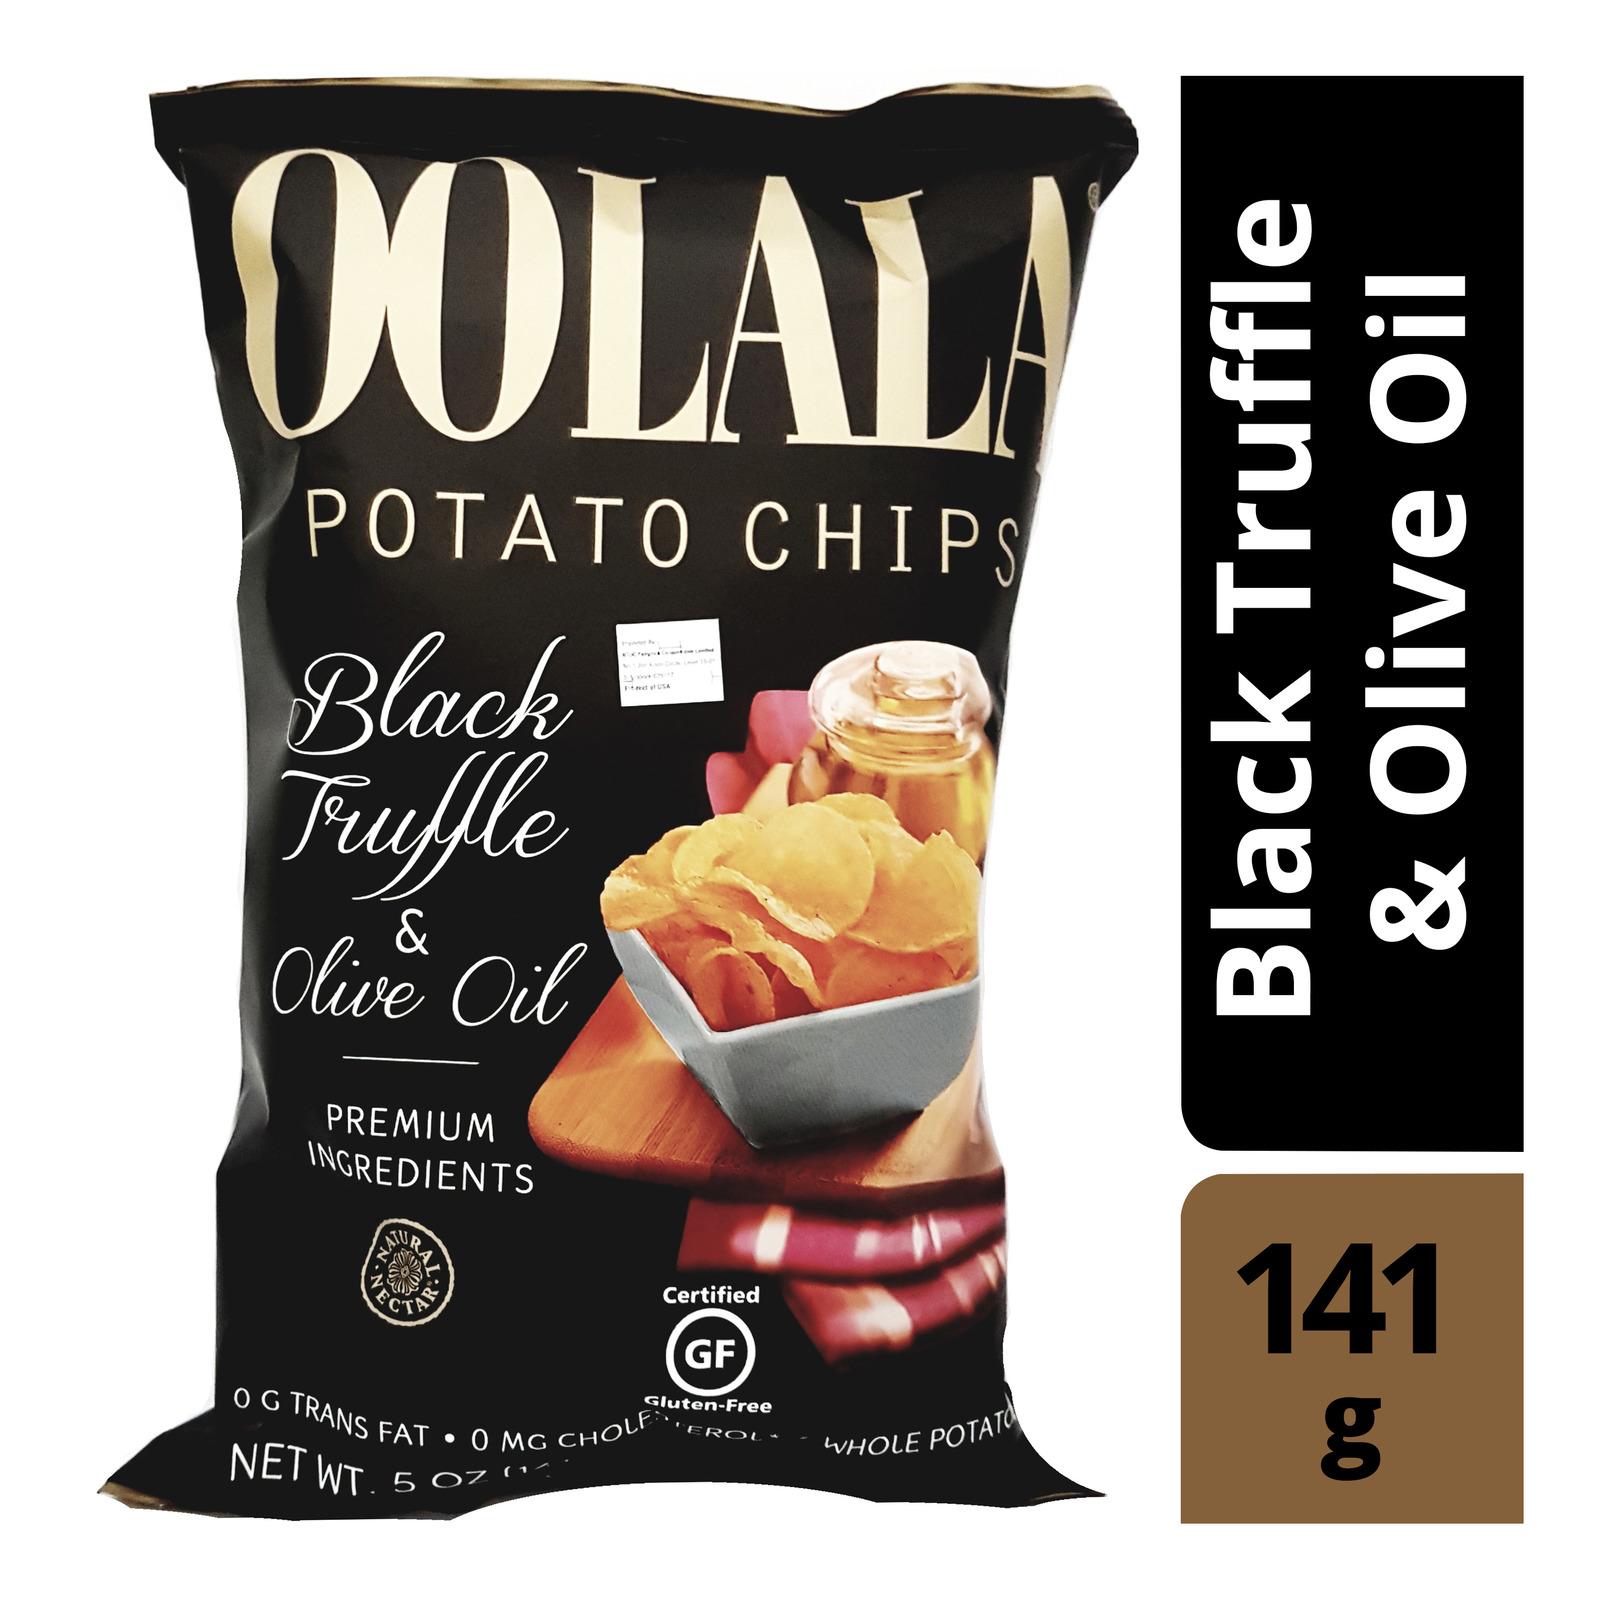 Oolala Potato Chips - Black Truffle & Olive Oil